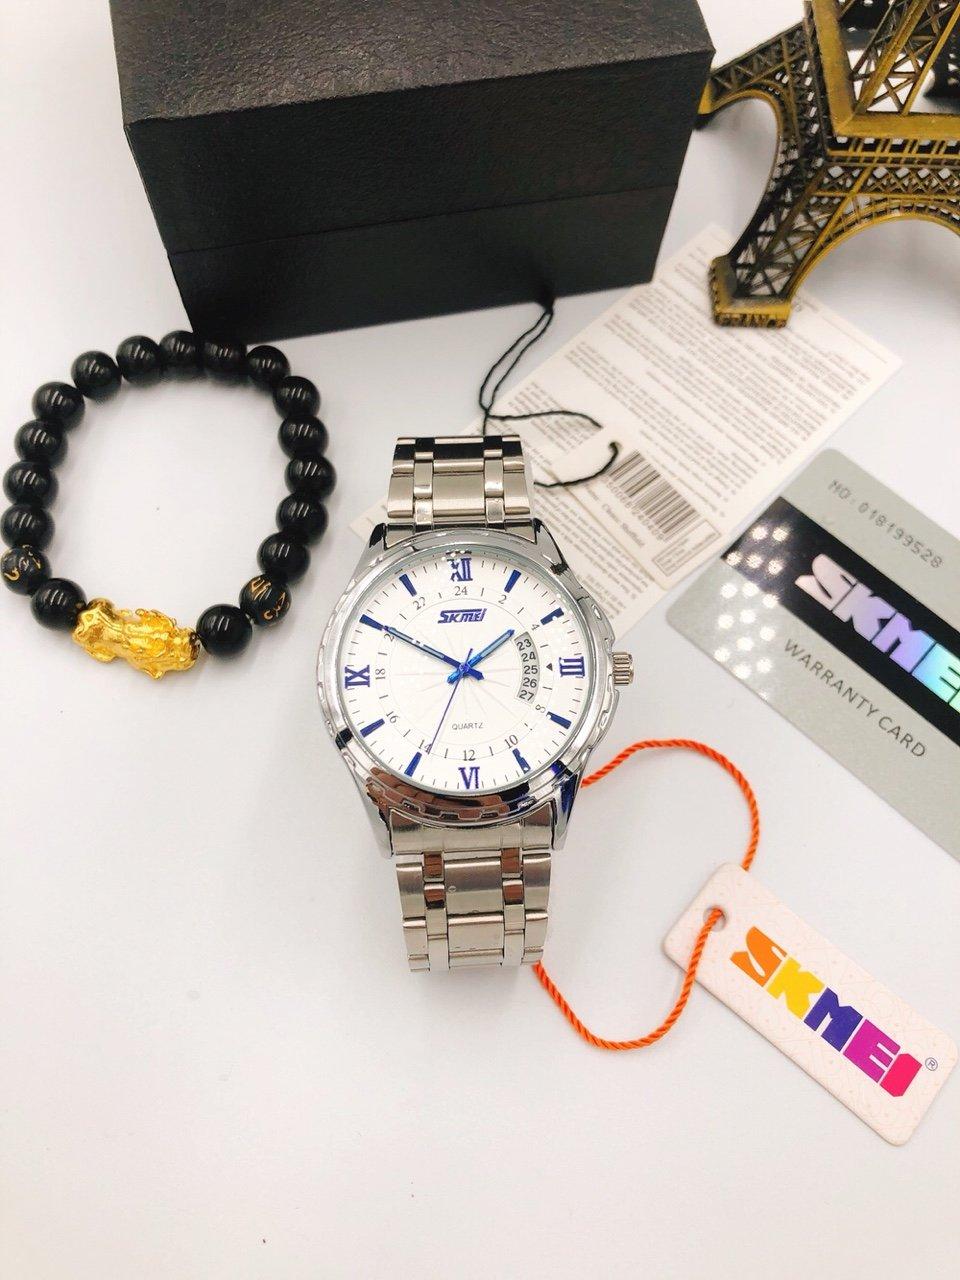 Đồng hồ nam cao cấp Skmei giá rẻ